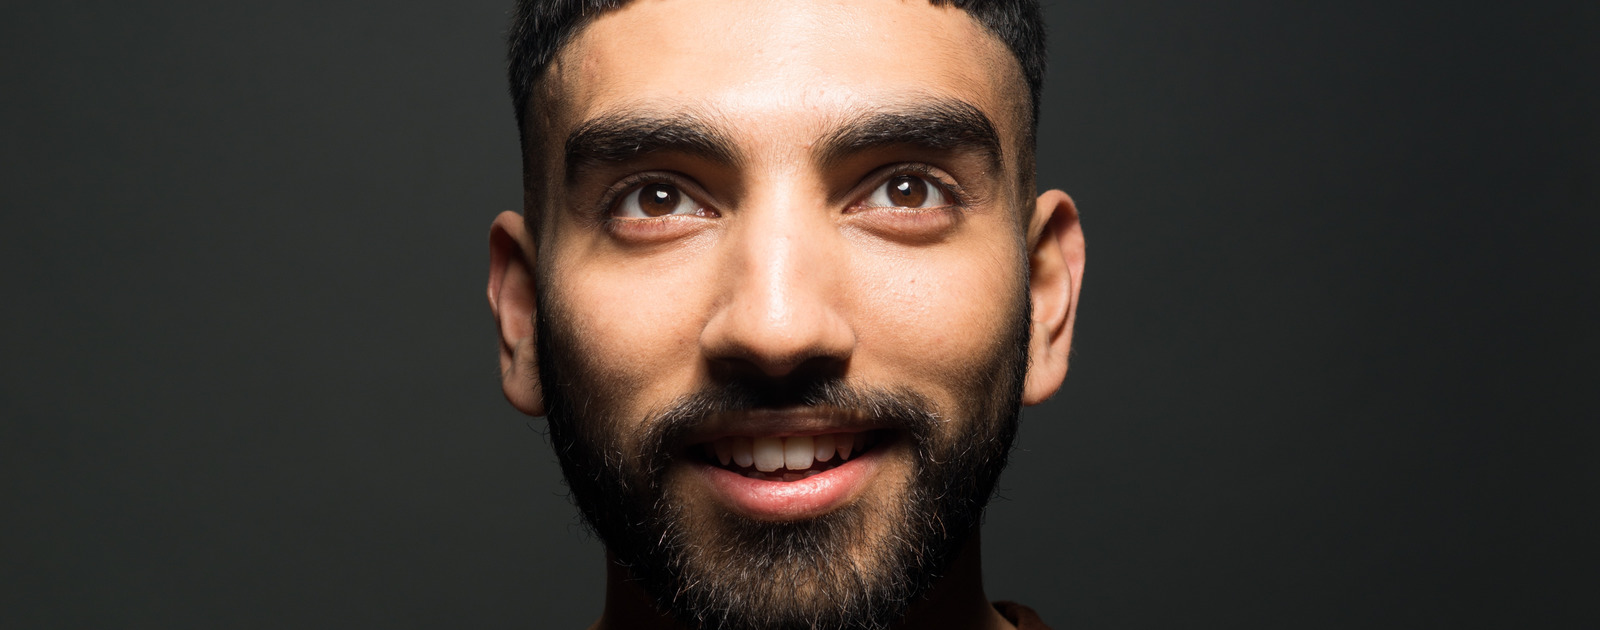 Portrait of Mawan Rizwan